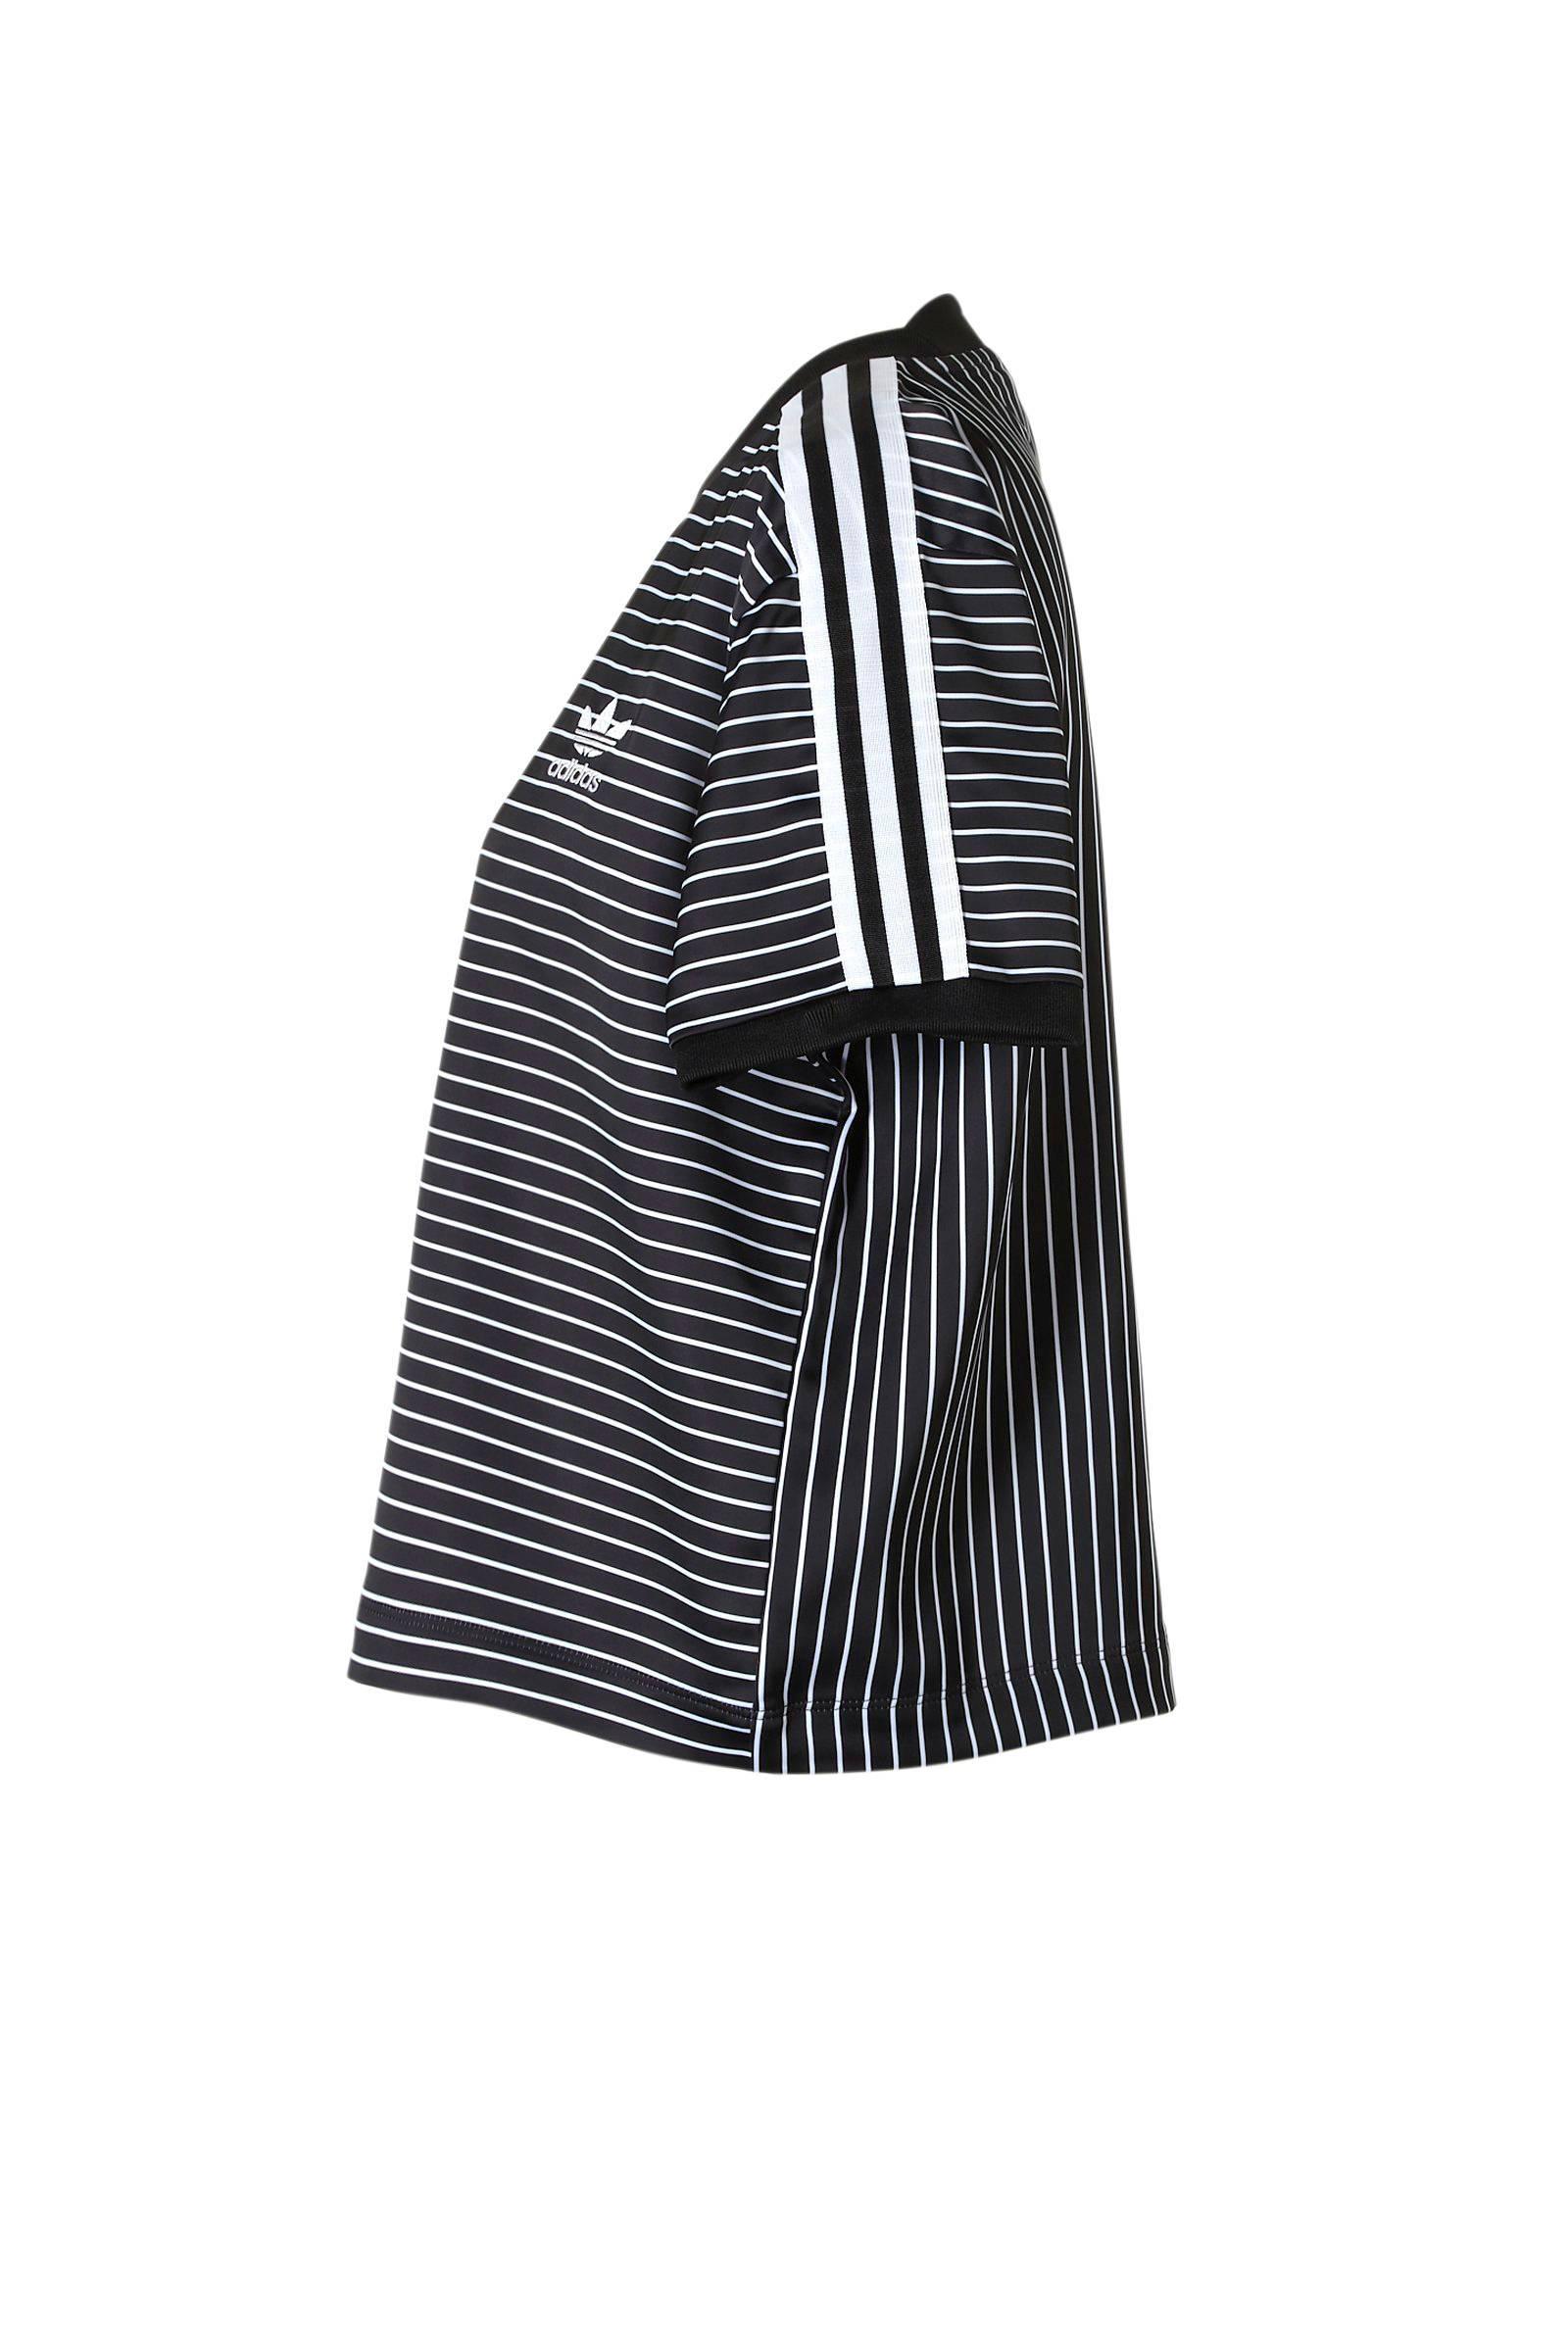 finest selection 2ea24 772fa Zwartwit Met Adidas Wehkamp T Originals Shirt Strepen wtxXq